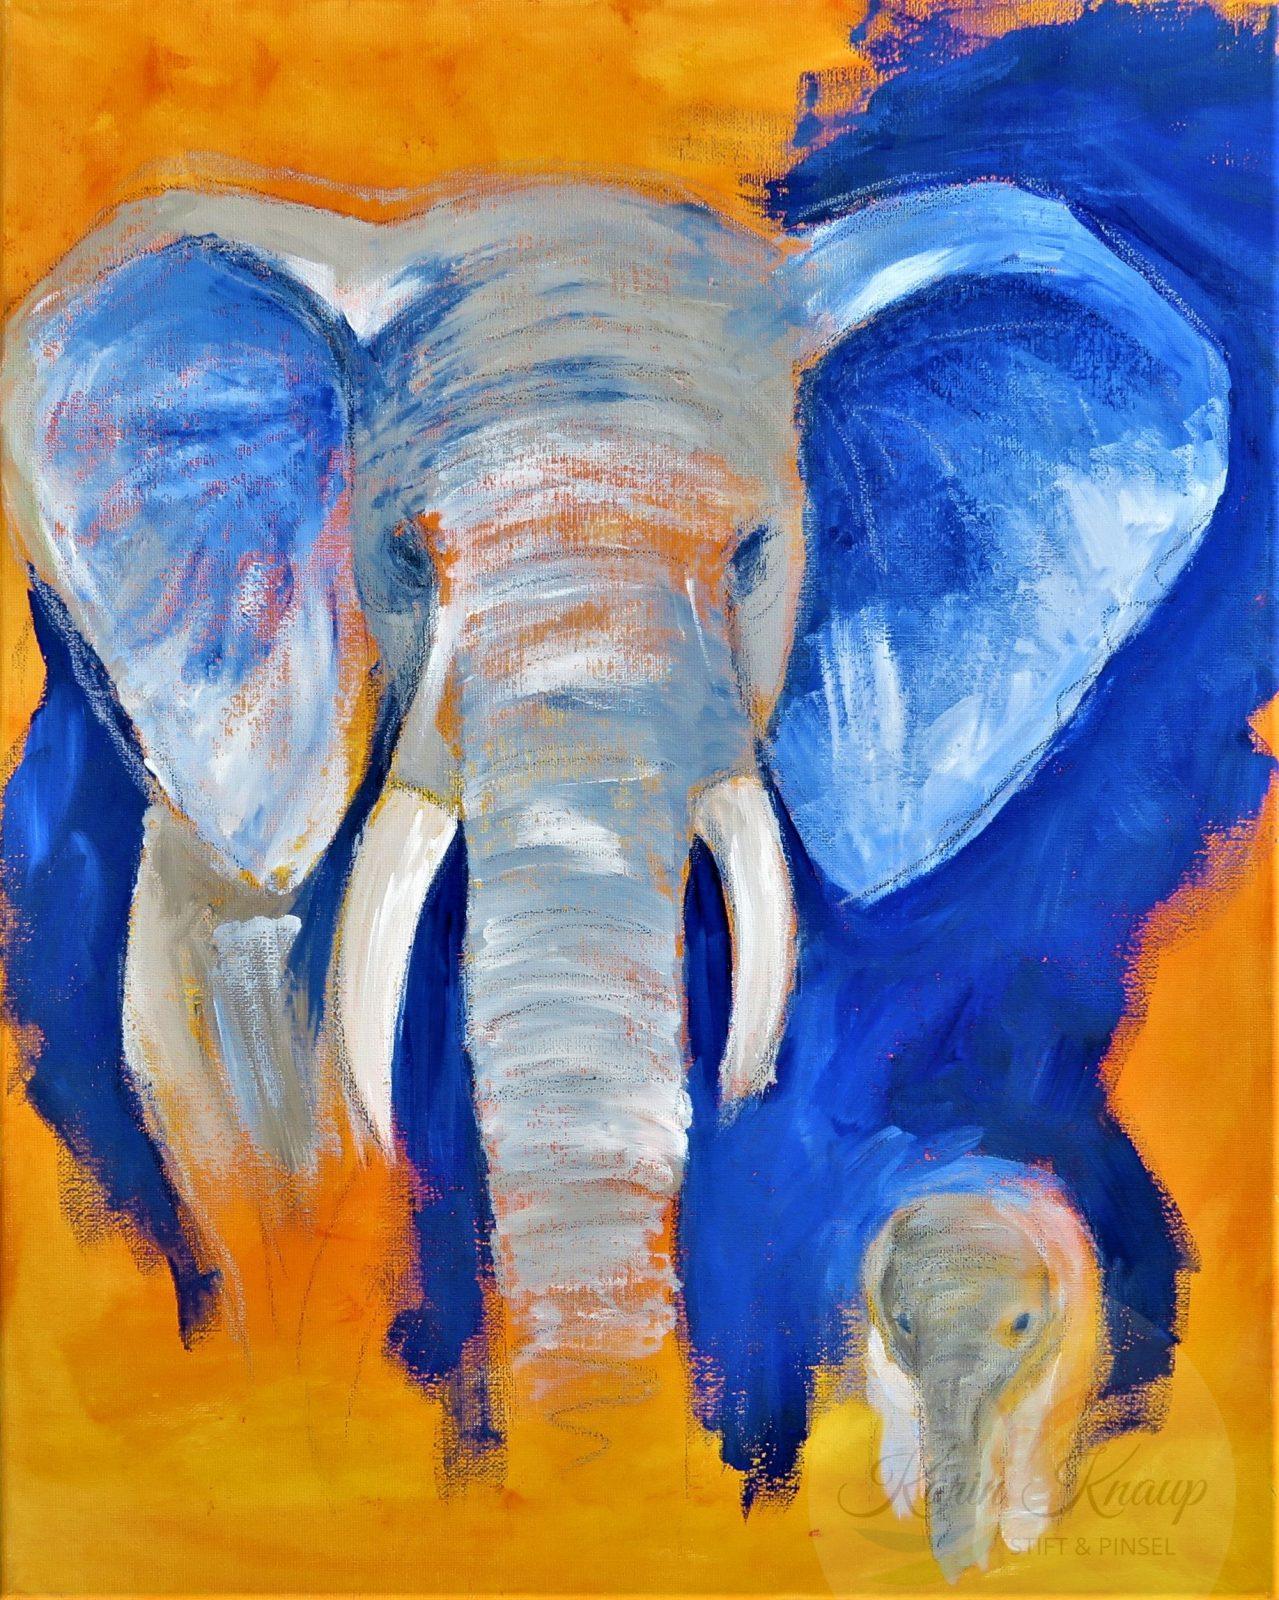 Elefanten Mama und Baby, Acryl auf Leinwand, 40 x 50 cm